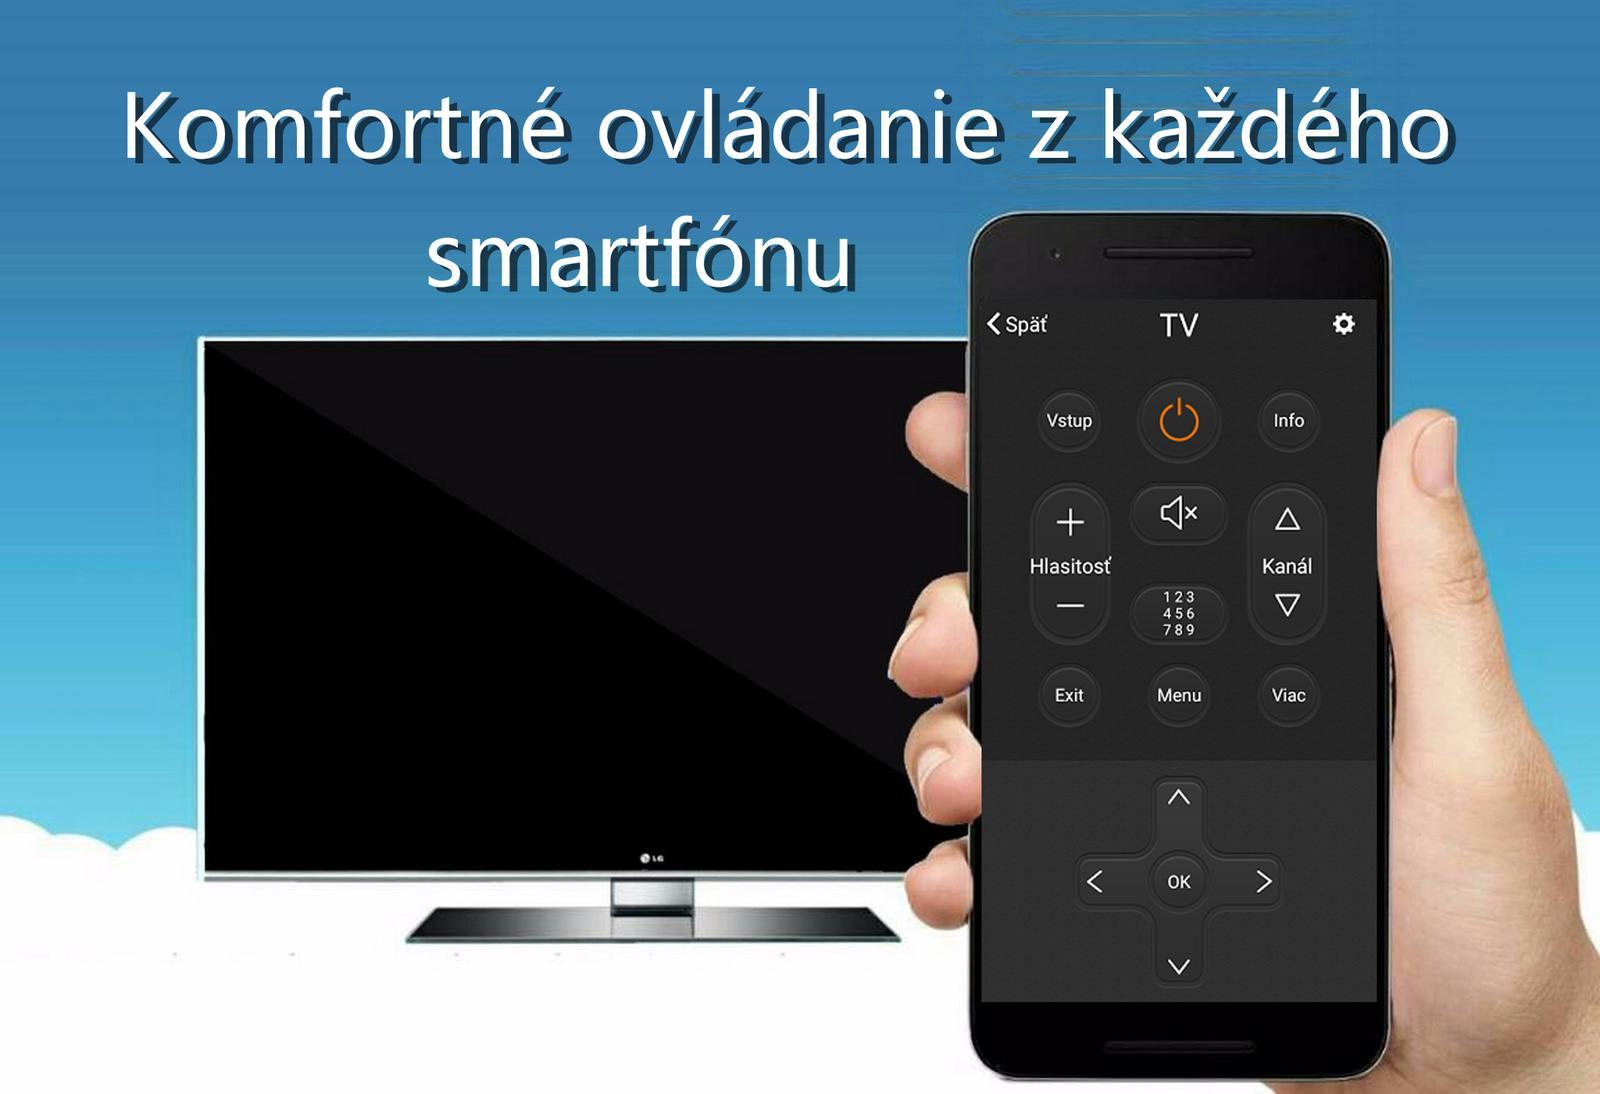 smartcomfort - Nepotrebujete infra